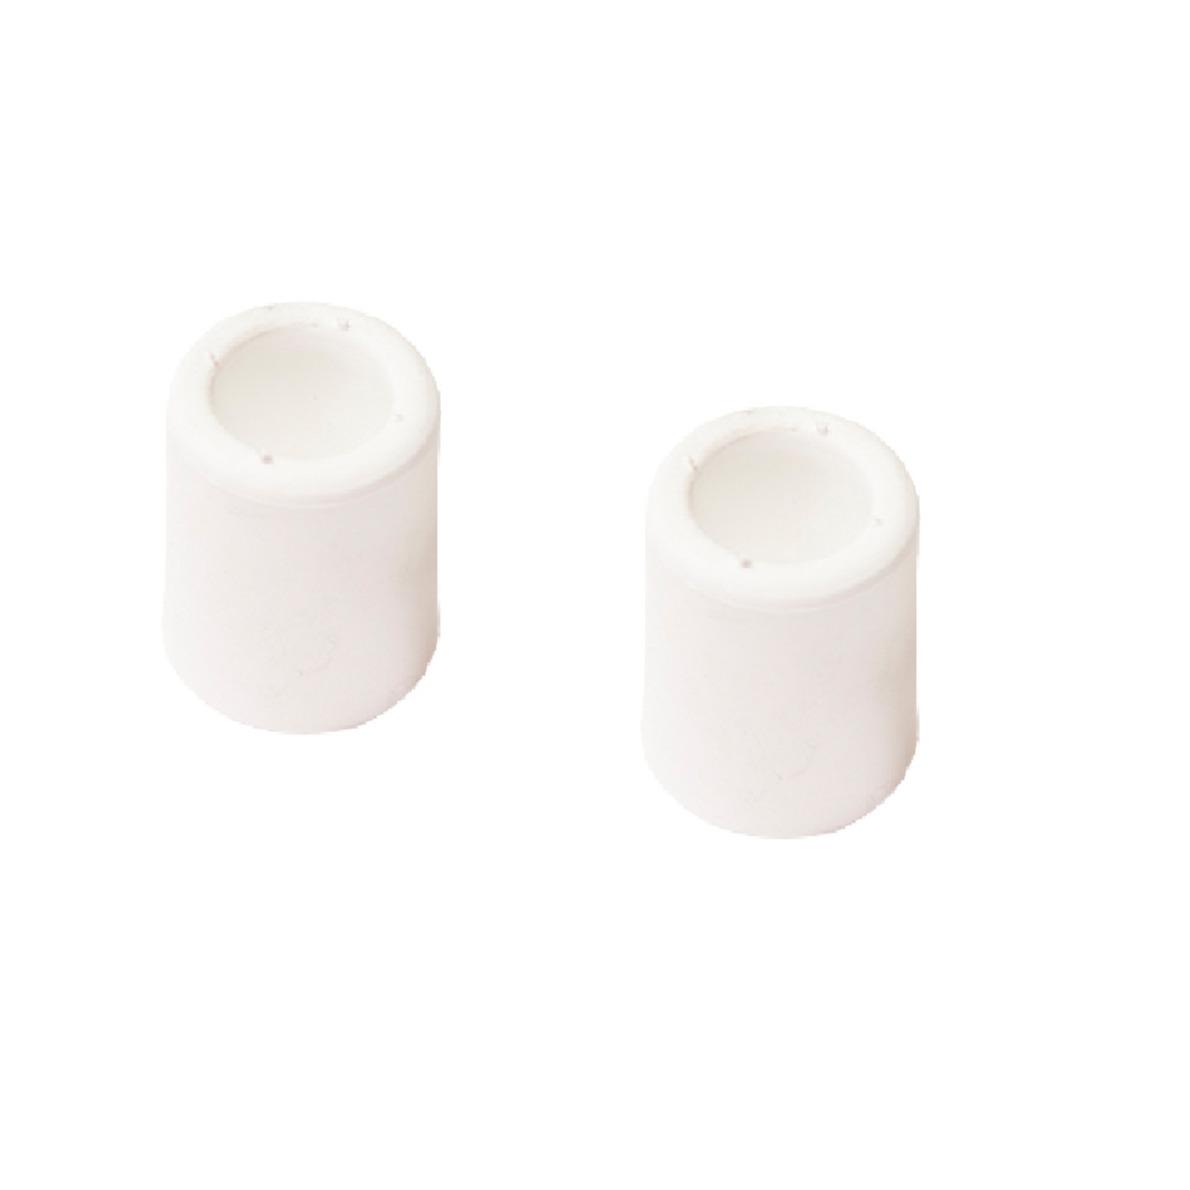 3x stuks deurstopper - deurbuffer rubber wit 35 mm